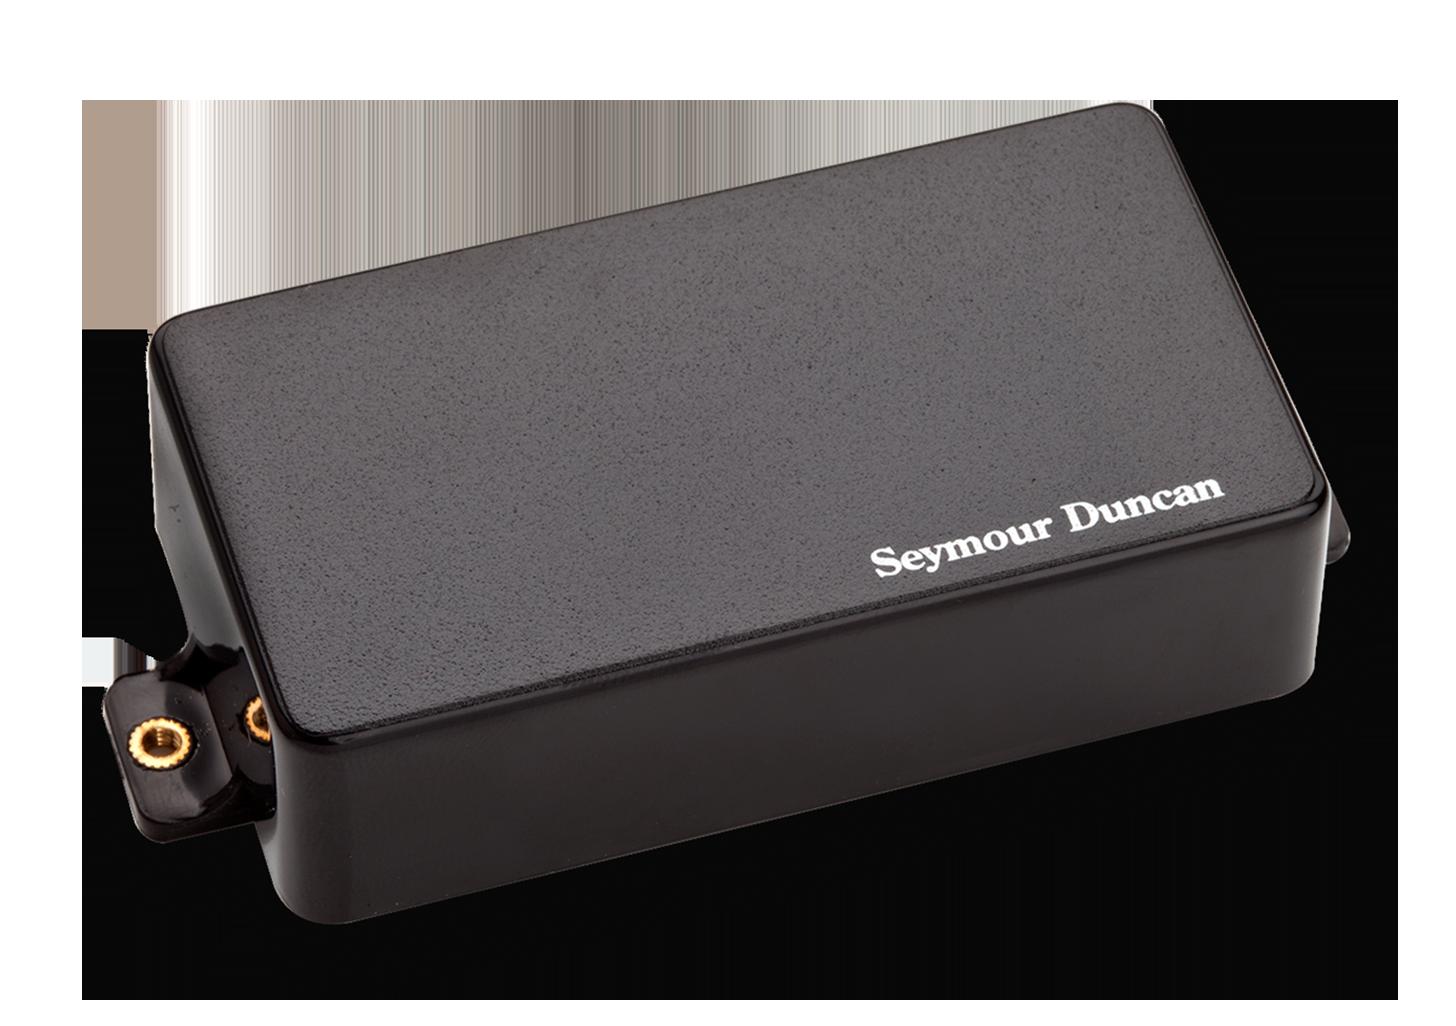 Seymour Duncan LiveWire II Classic Humbucker - Neck Black